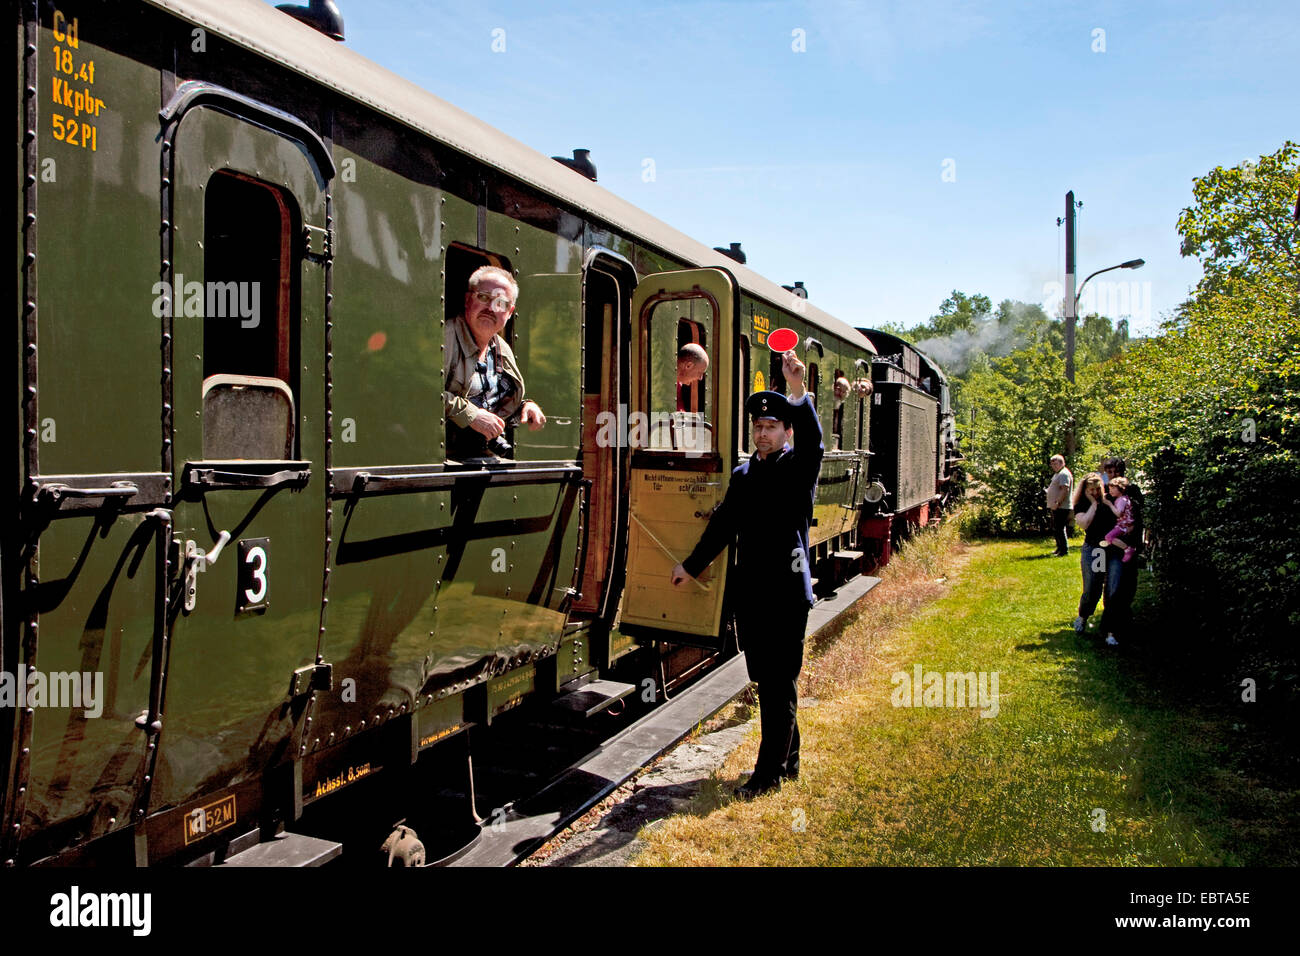 Ruhr Valley Railway, Germany, North Rhine-Westphalia, Ruhr Area, Witten - Stock Image